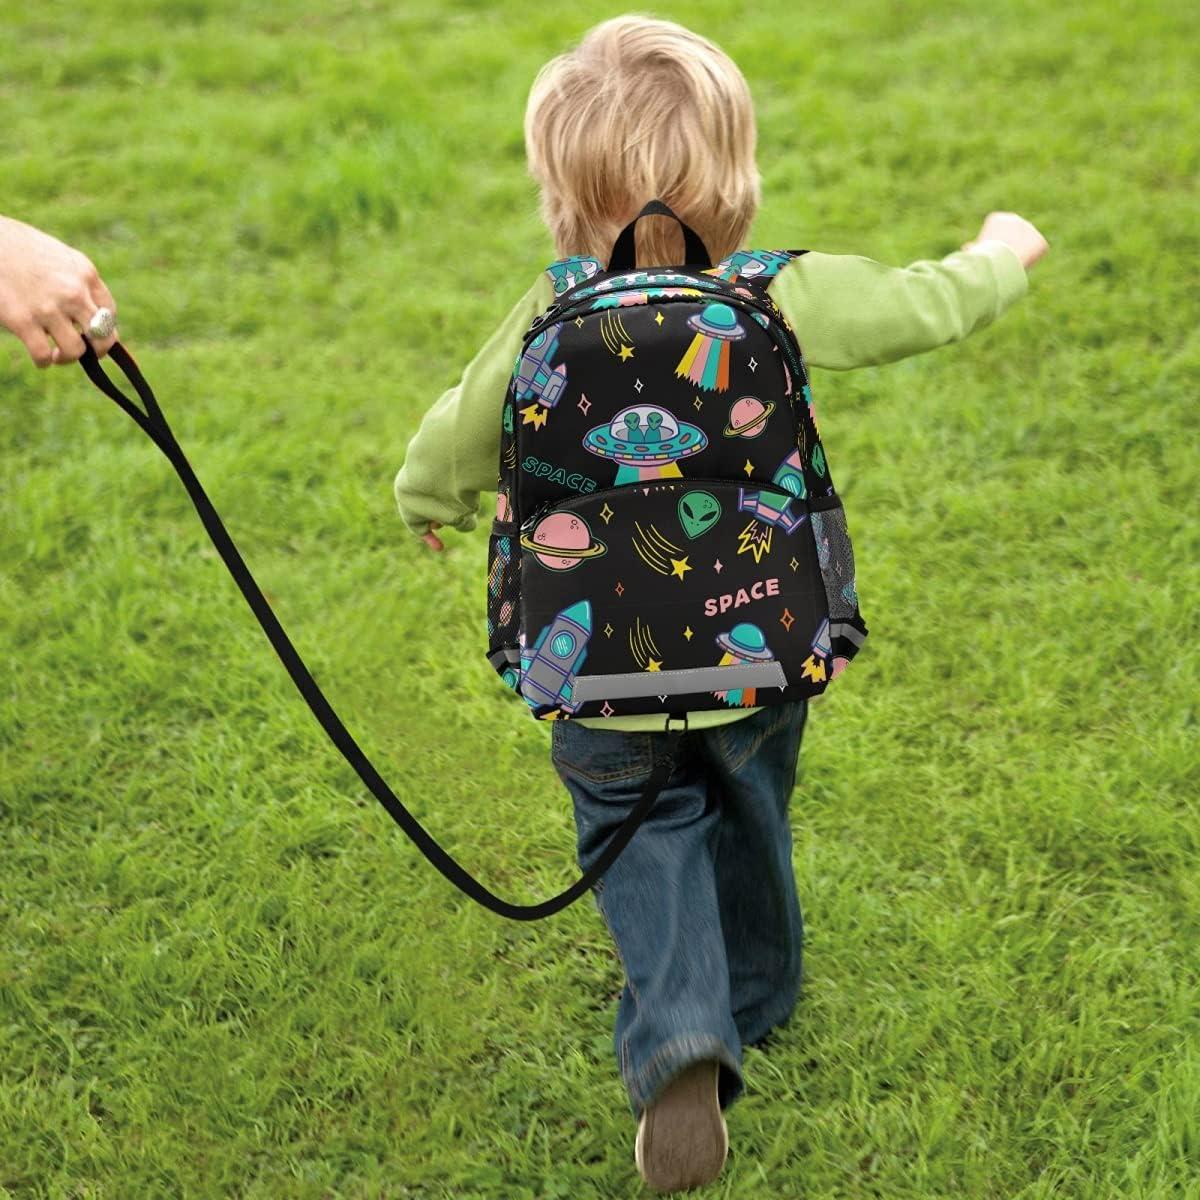 OREZI Kid's Toddler Backpack for Boys Girls,UFO Aliens Spaceship Planet Preschool Bag Nursery Travel Bag Daycare Bag Kindergarten Children Bag with Safety Leash